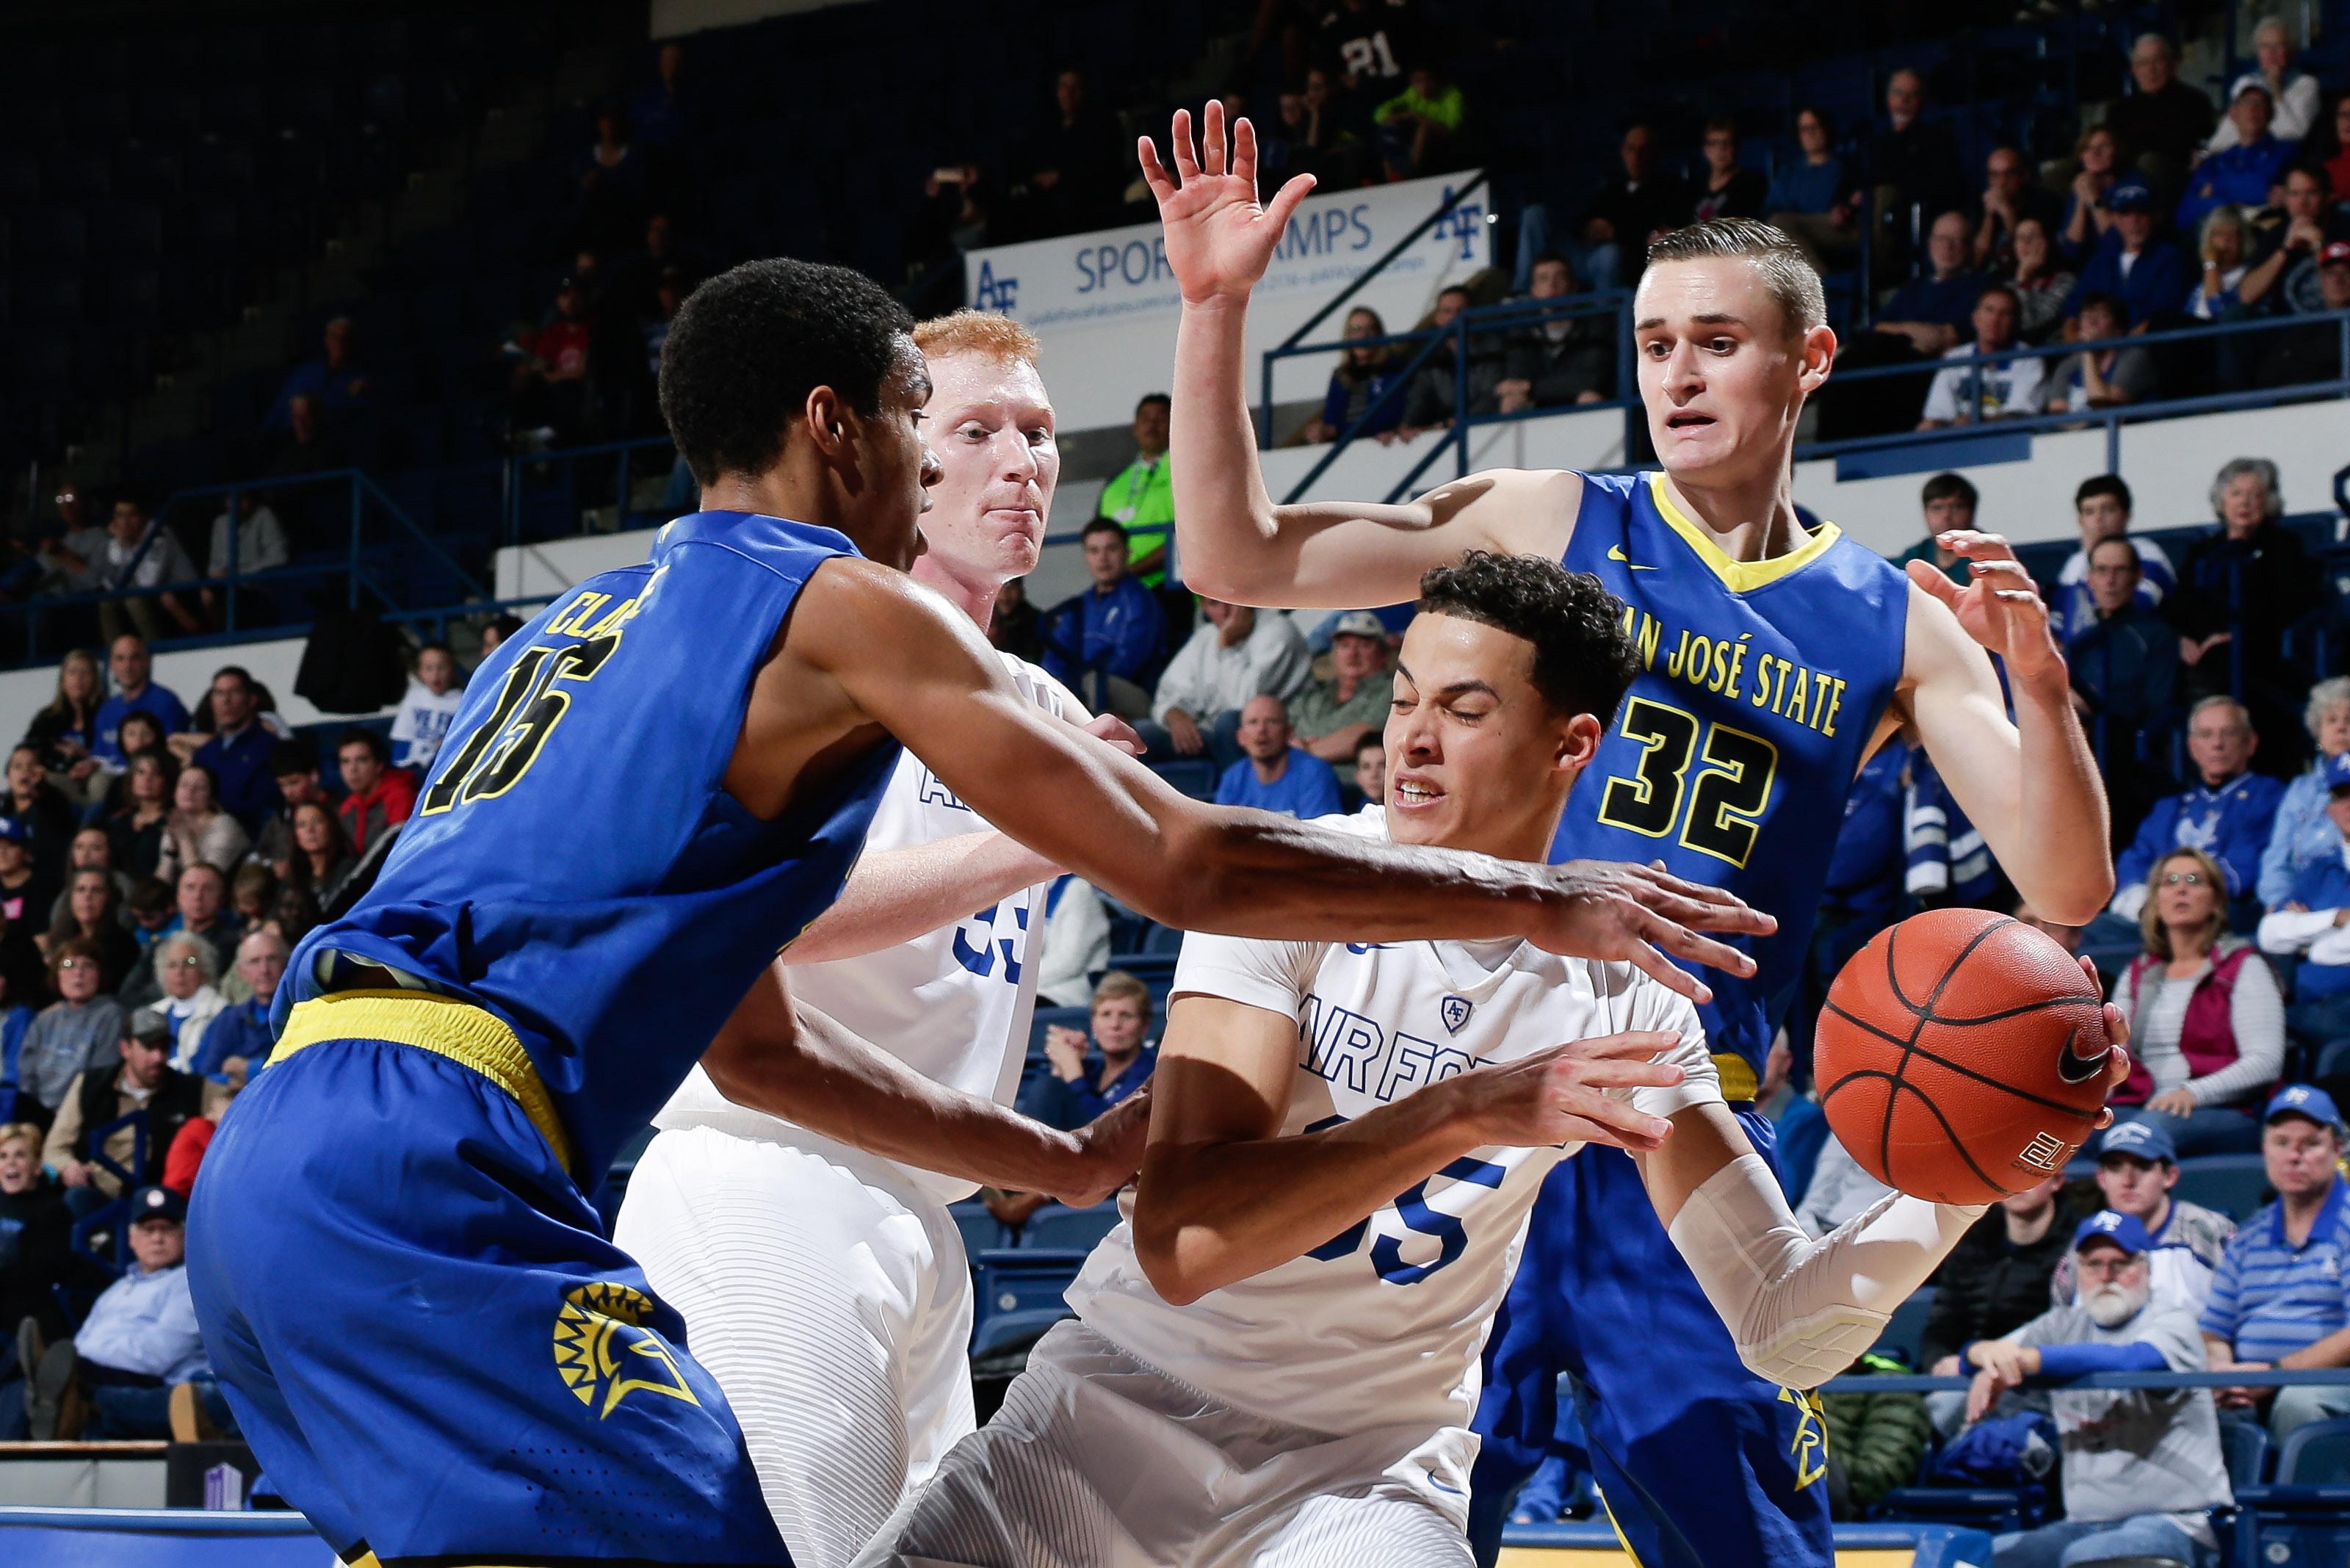 NCAA Basketball: San Jose State at Air Force